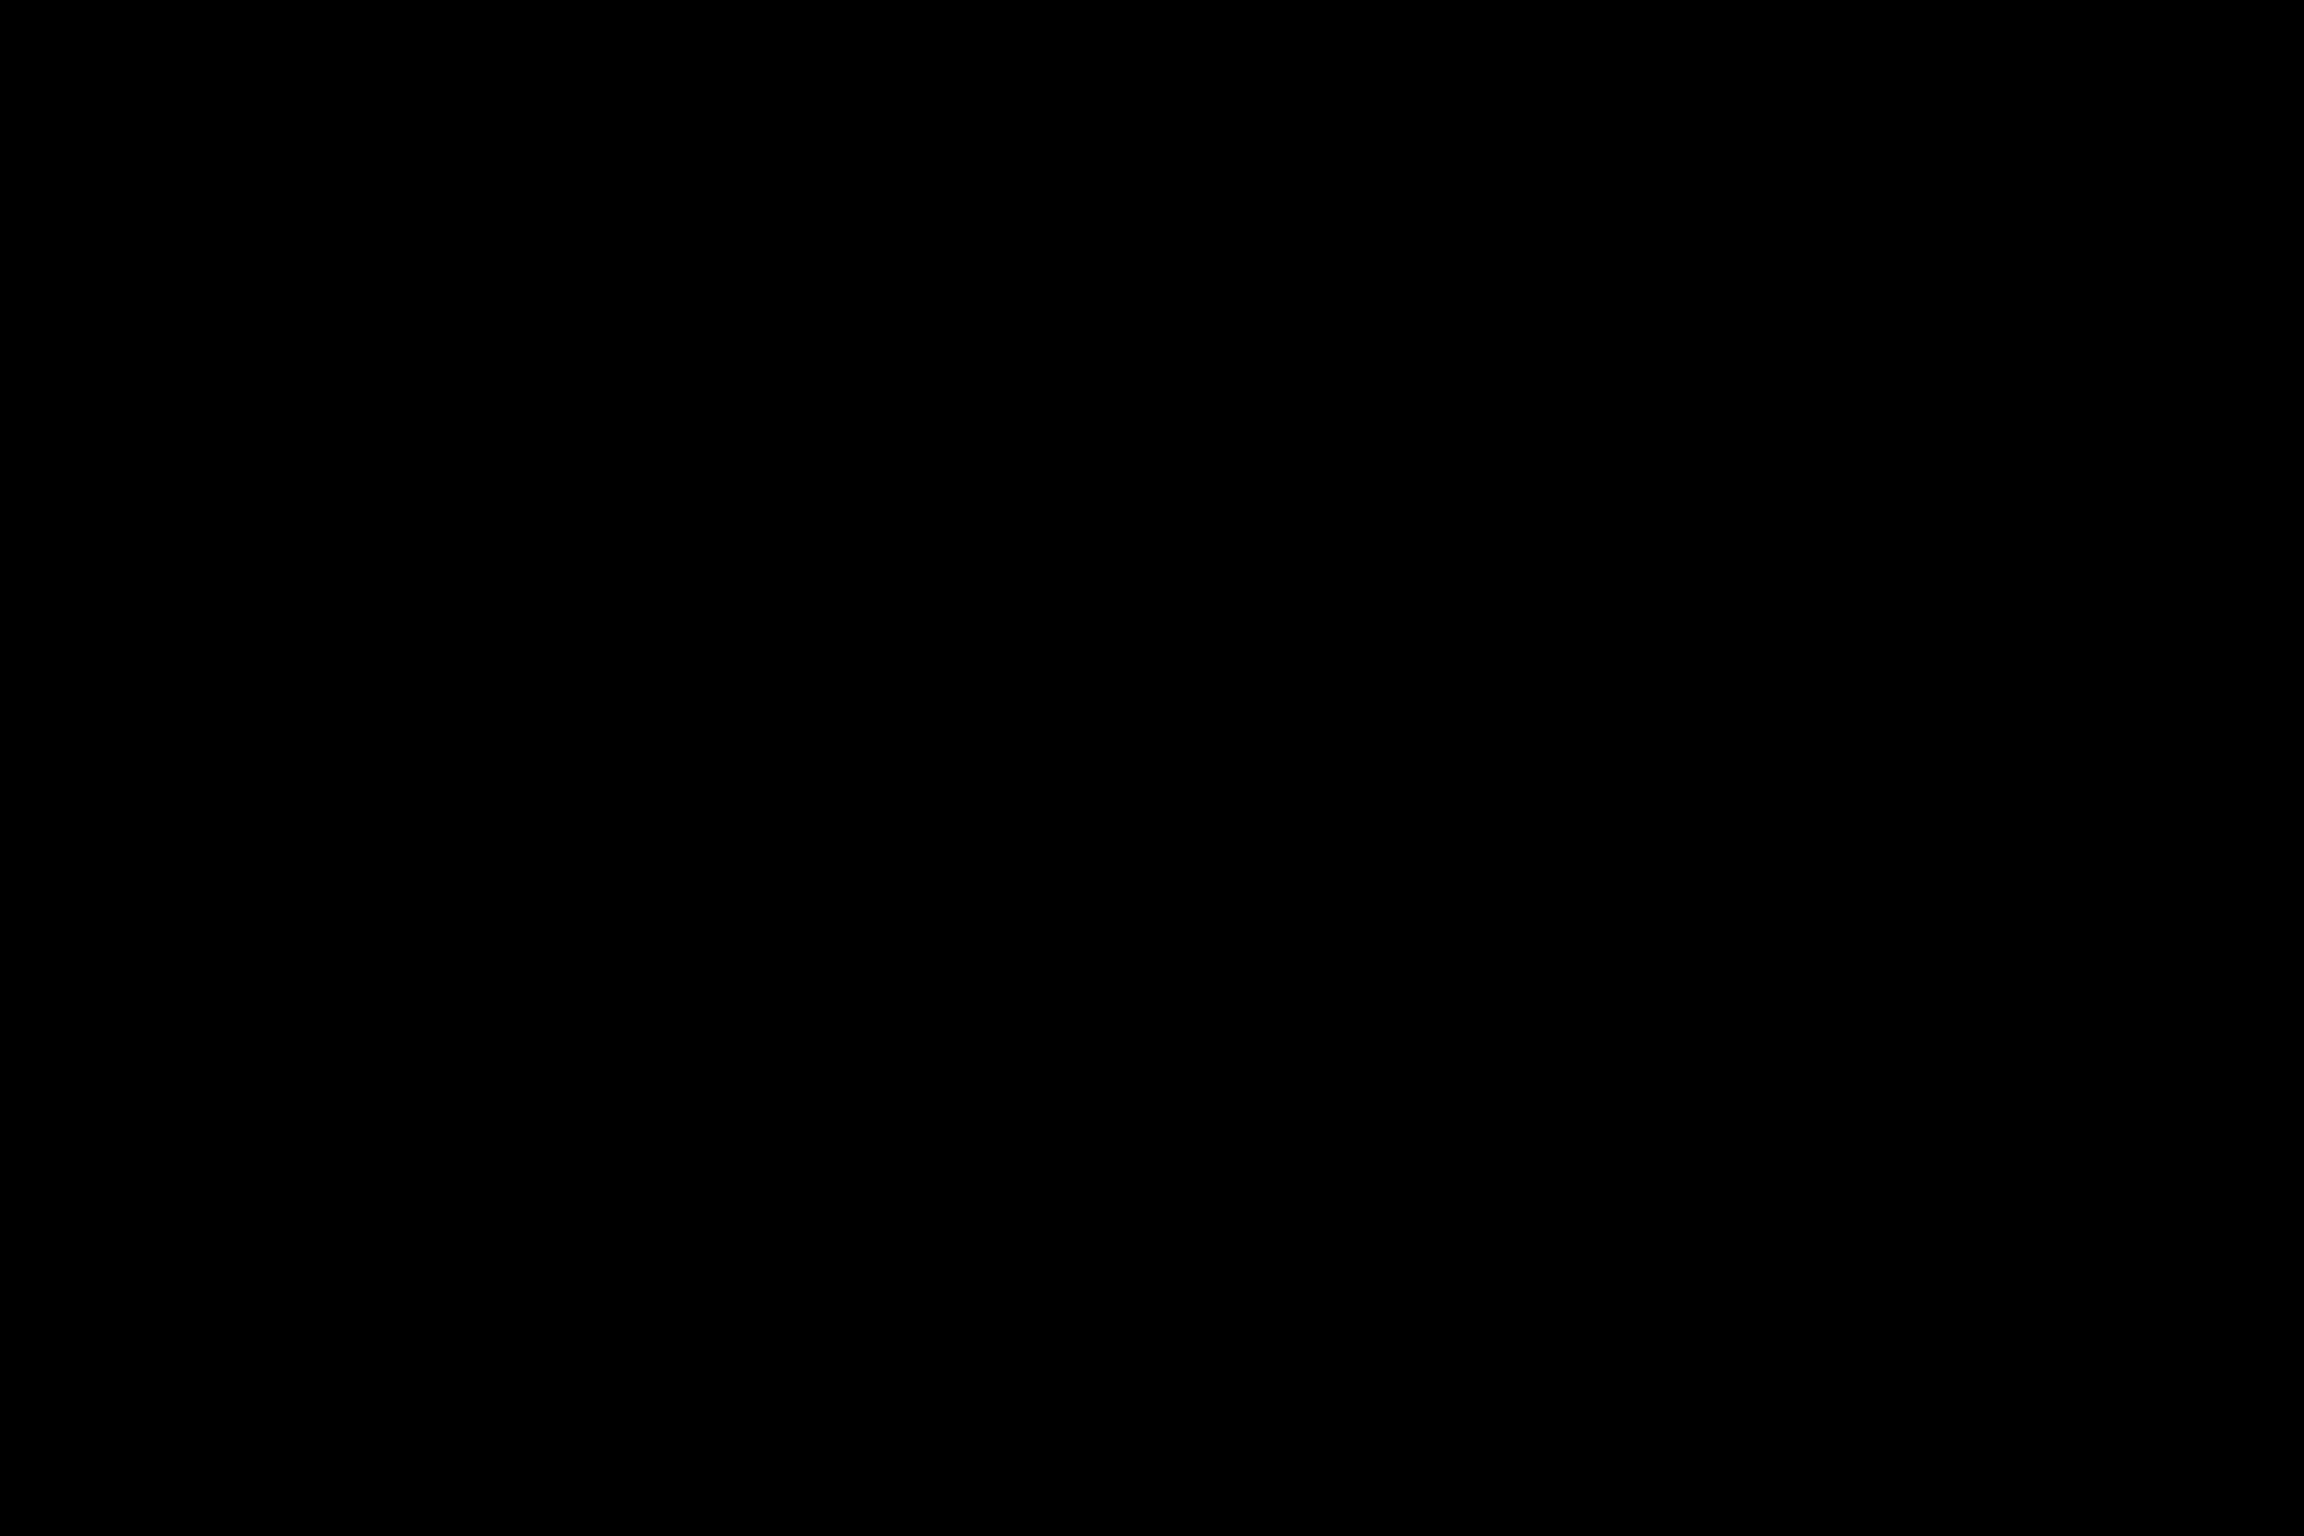 echelon-ii-photo-detail-reflective-panels-4c-low-res